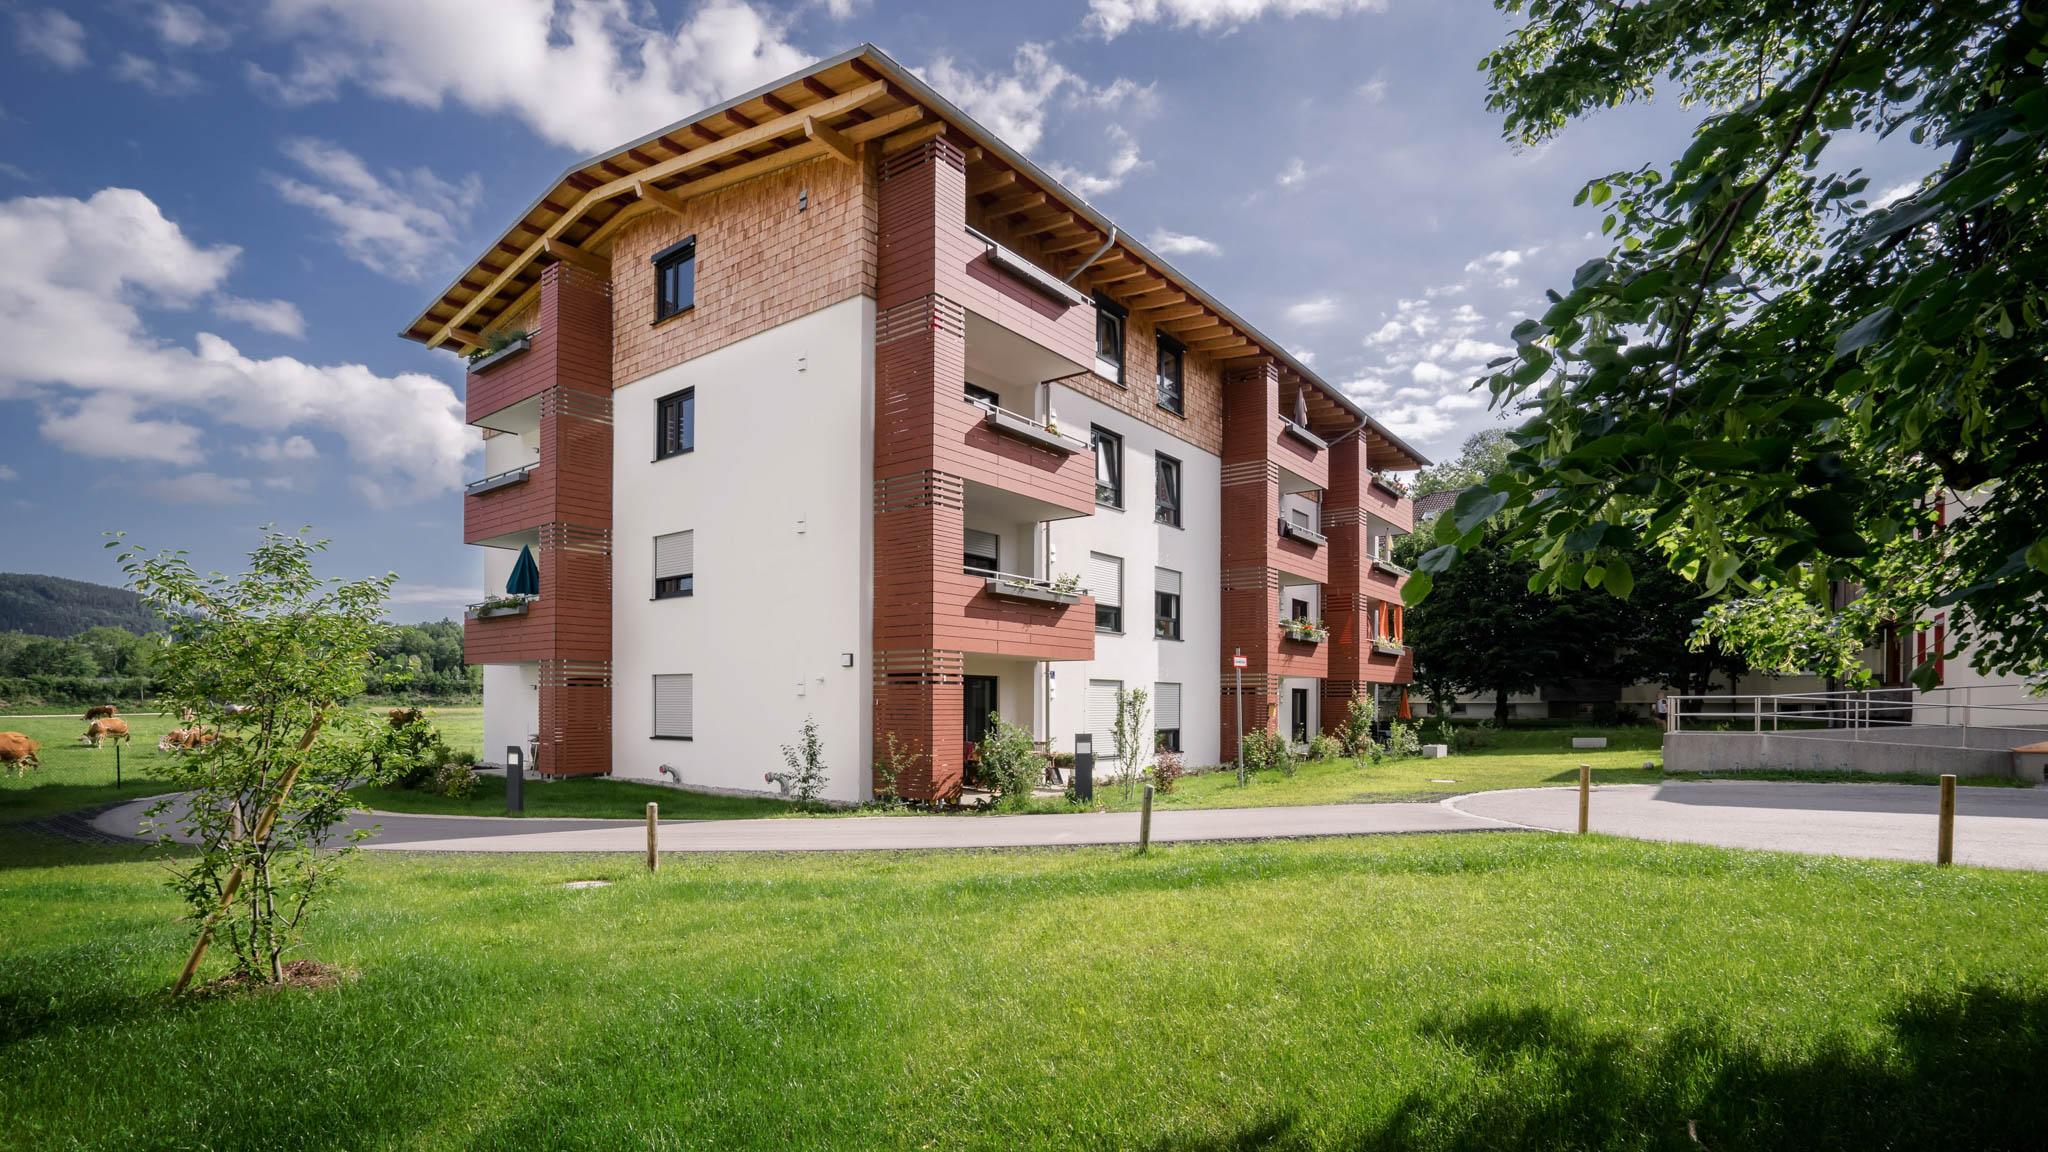 portfolio-bauunternehmen-fuch-mehrfamilienhaus-marzoll-1.jpg